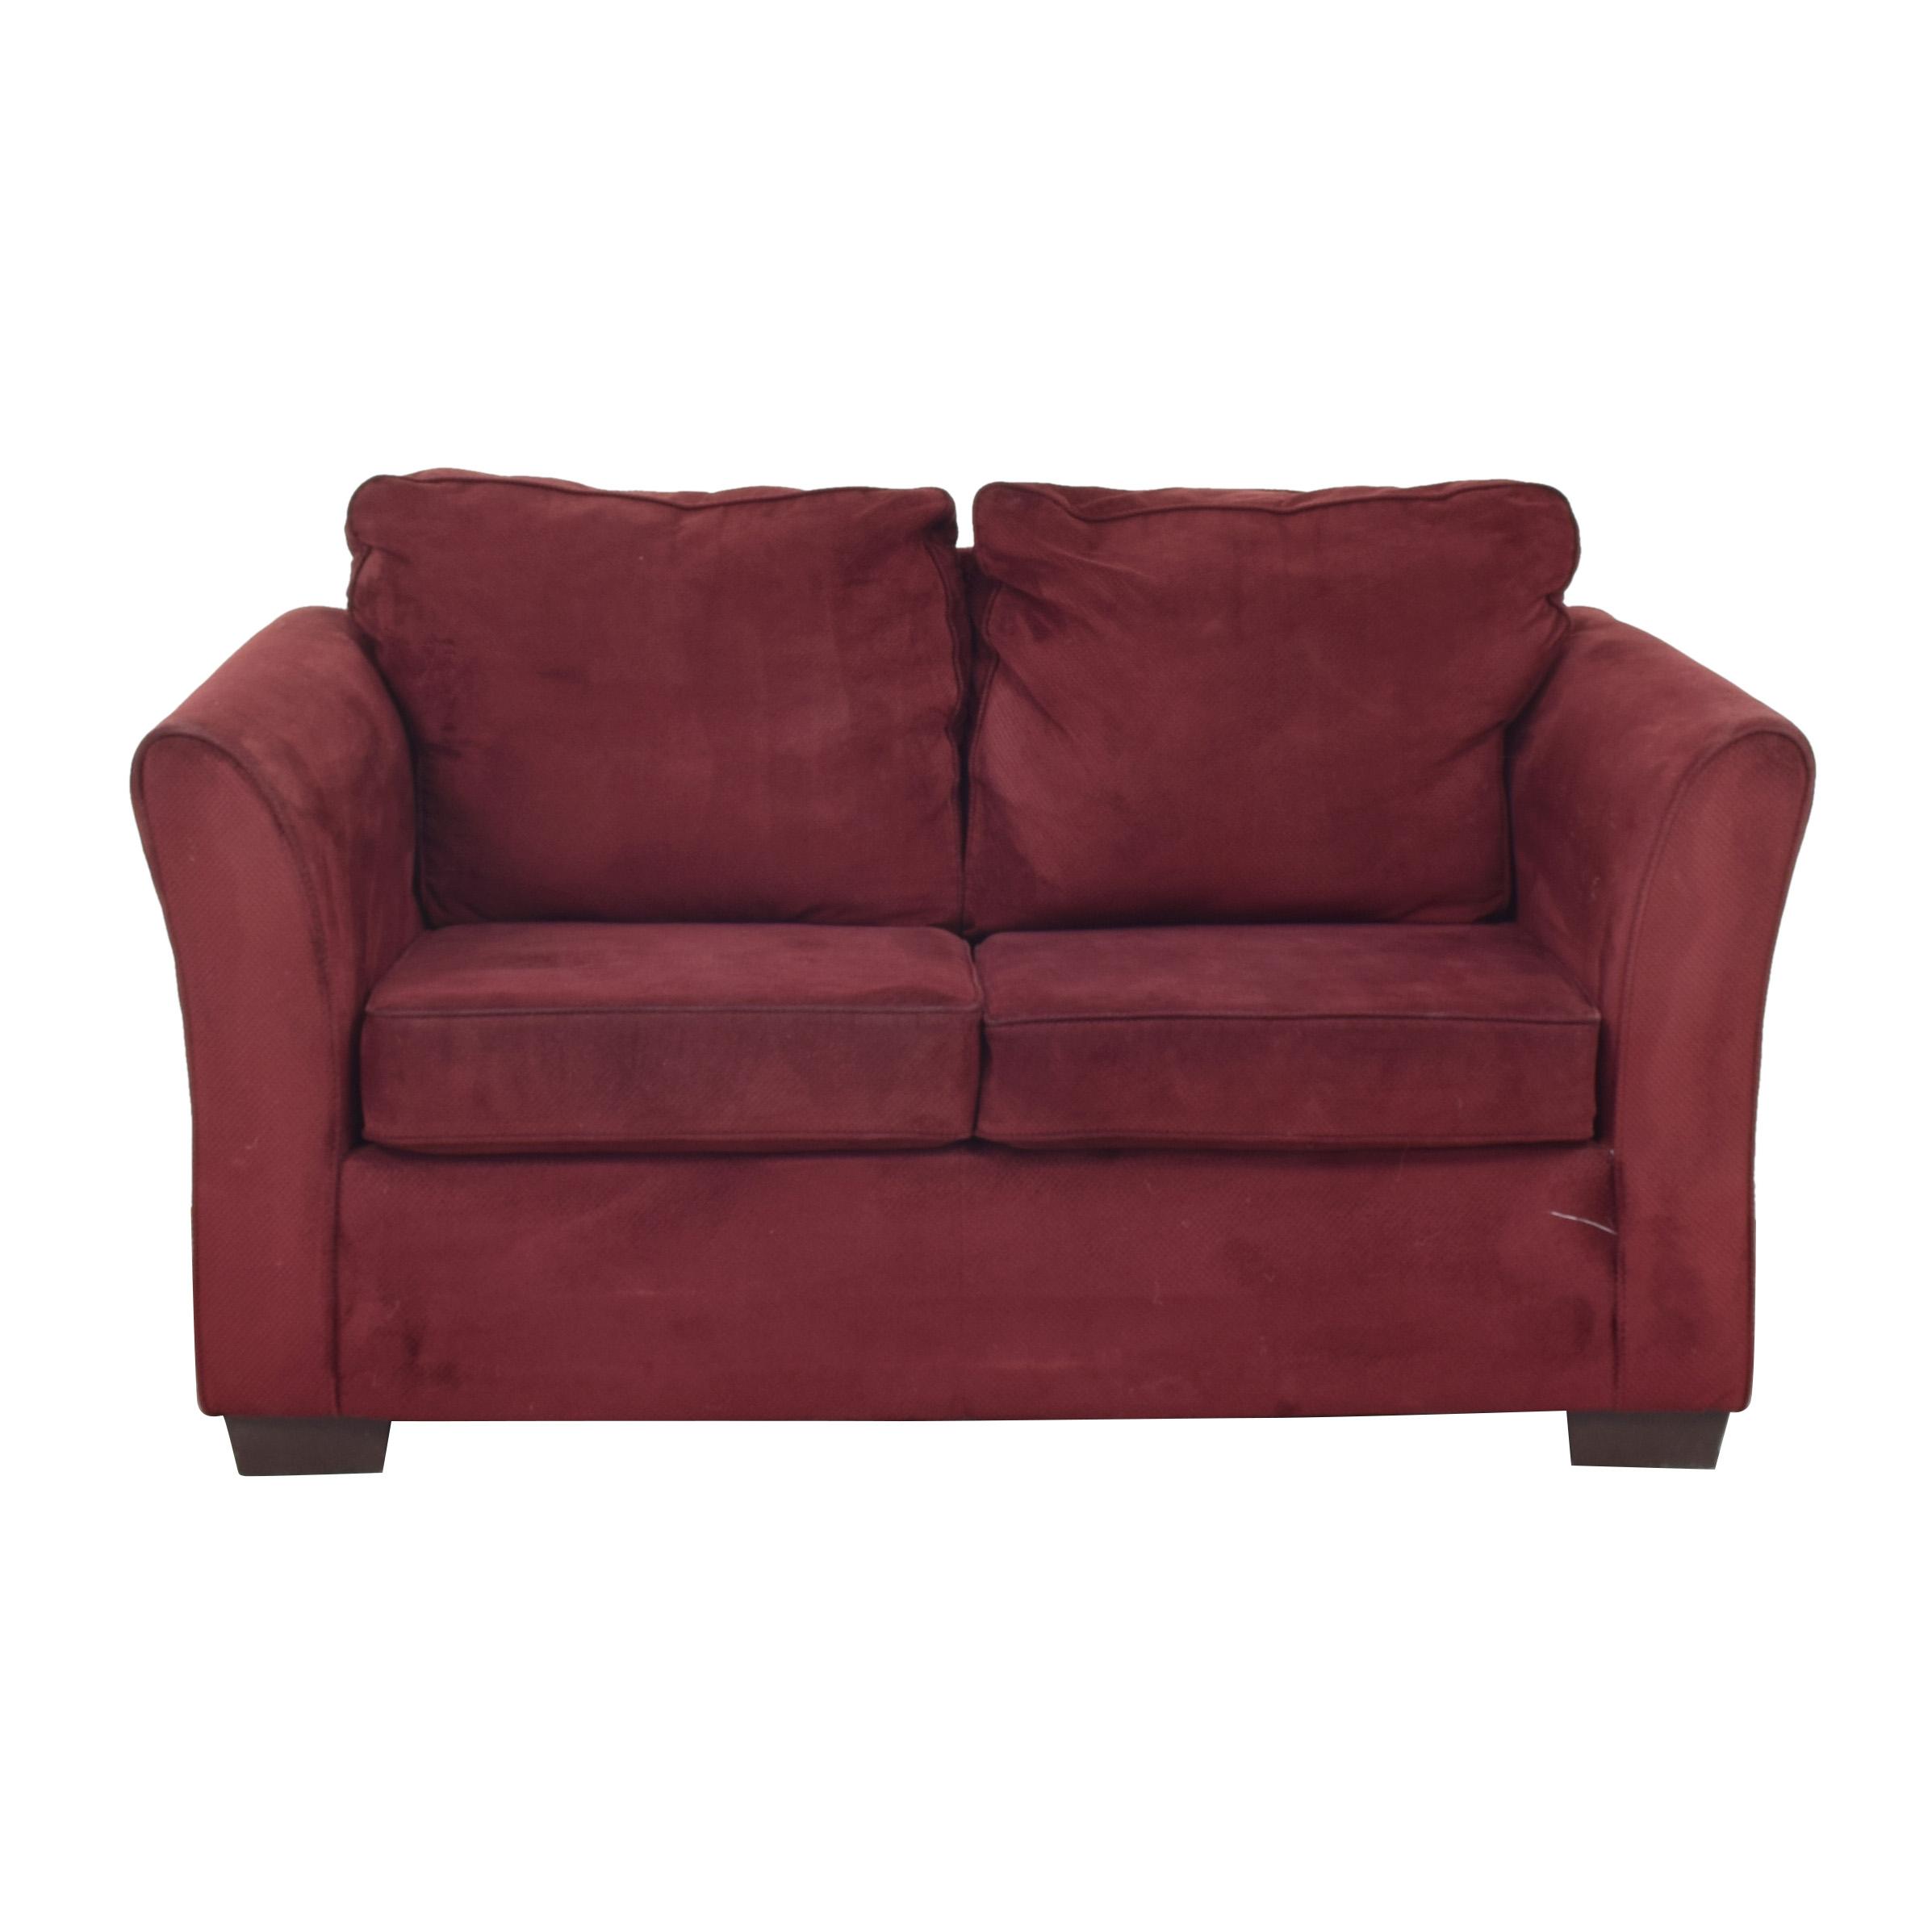 United Furniture United Furniture by Simmons Malibu Wine Loves dimensions